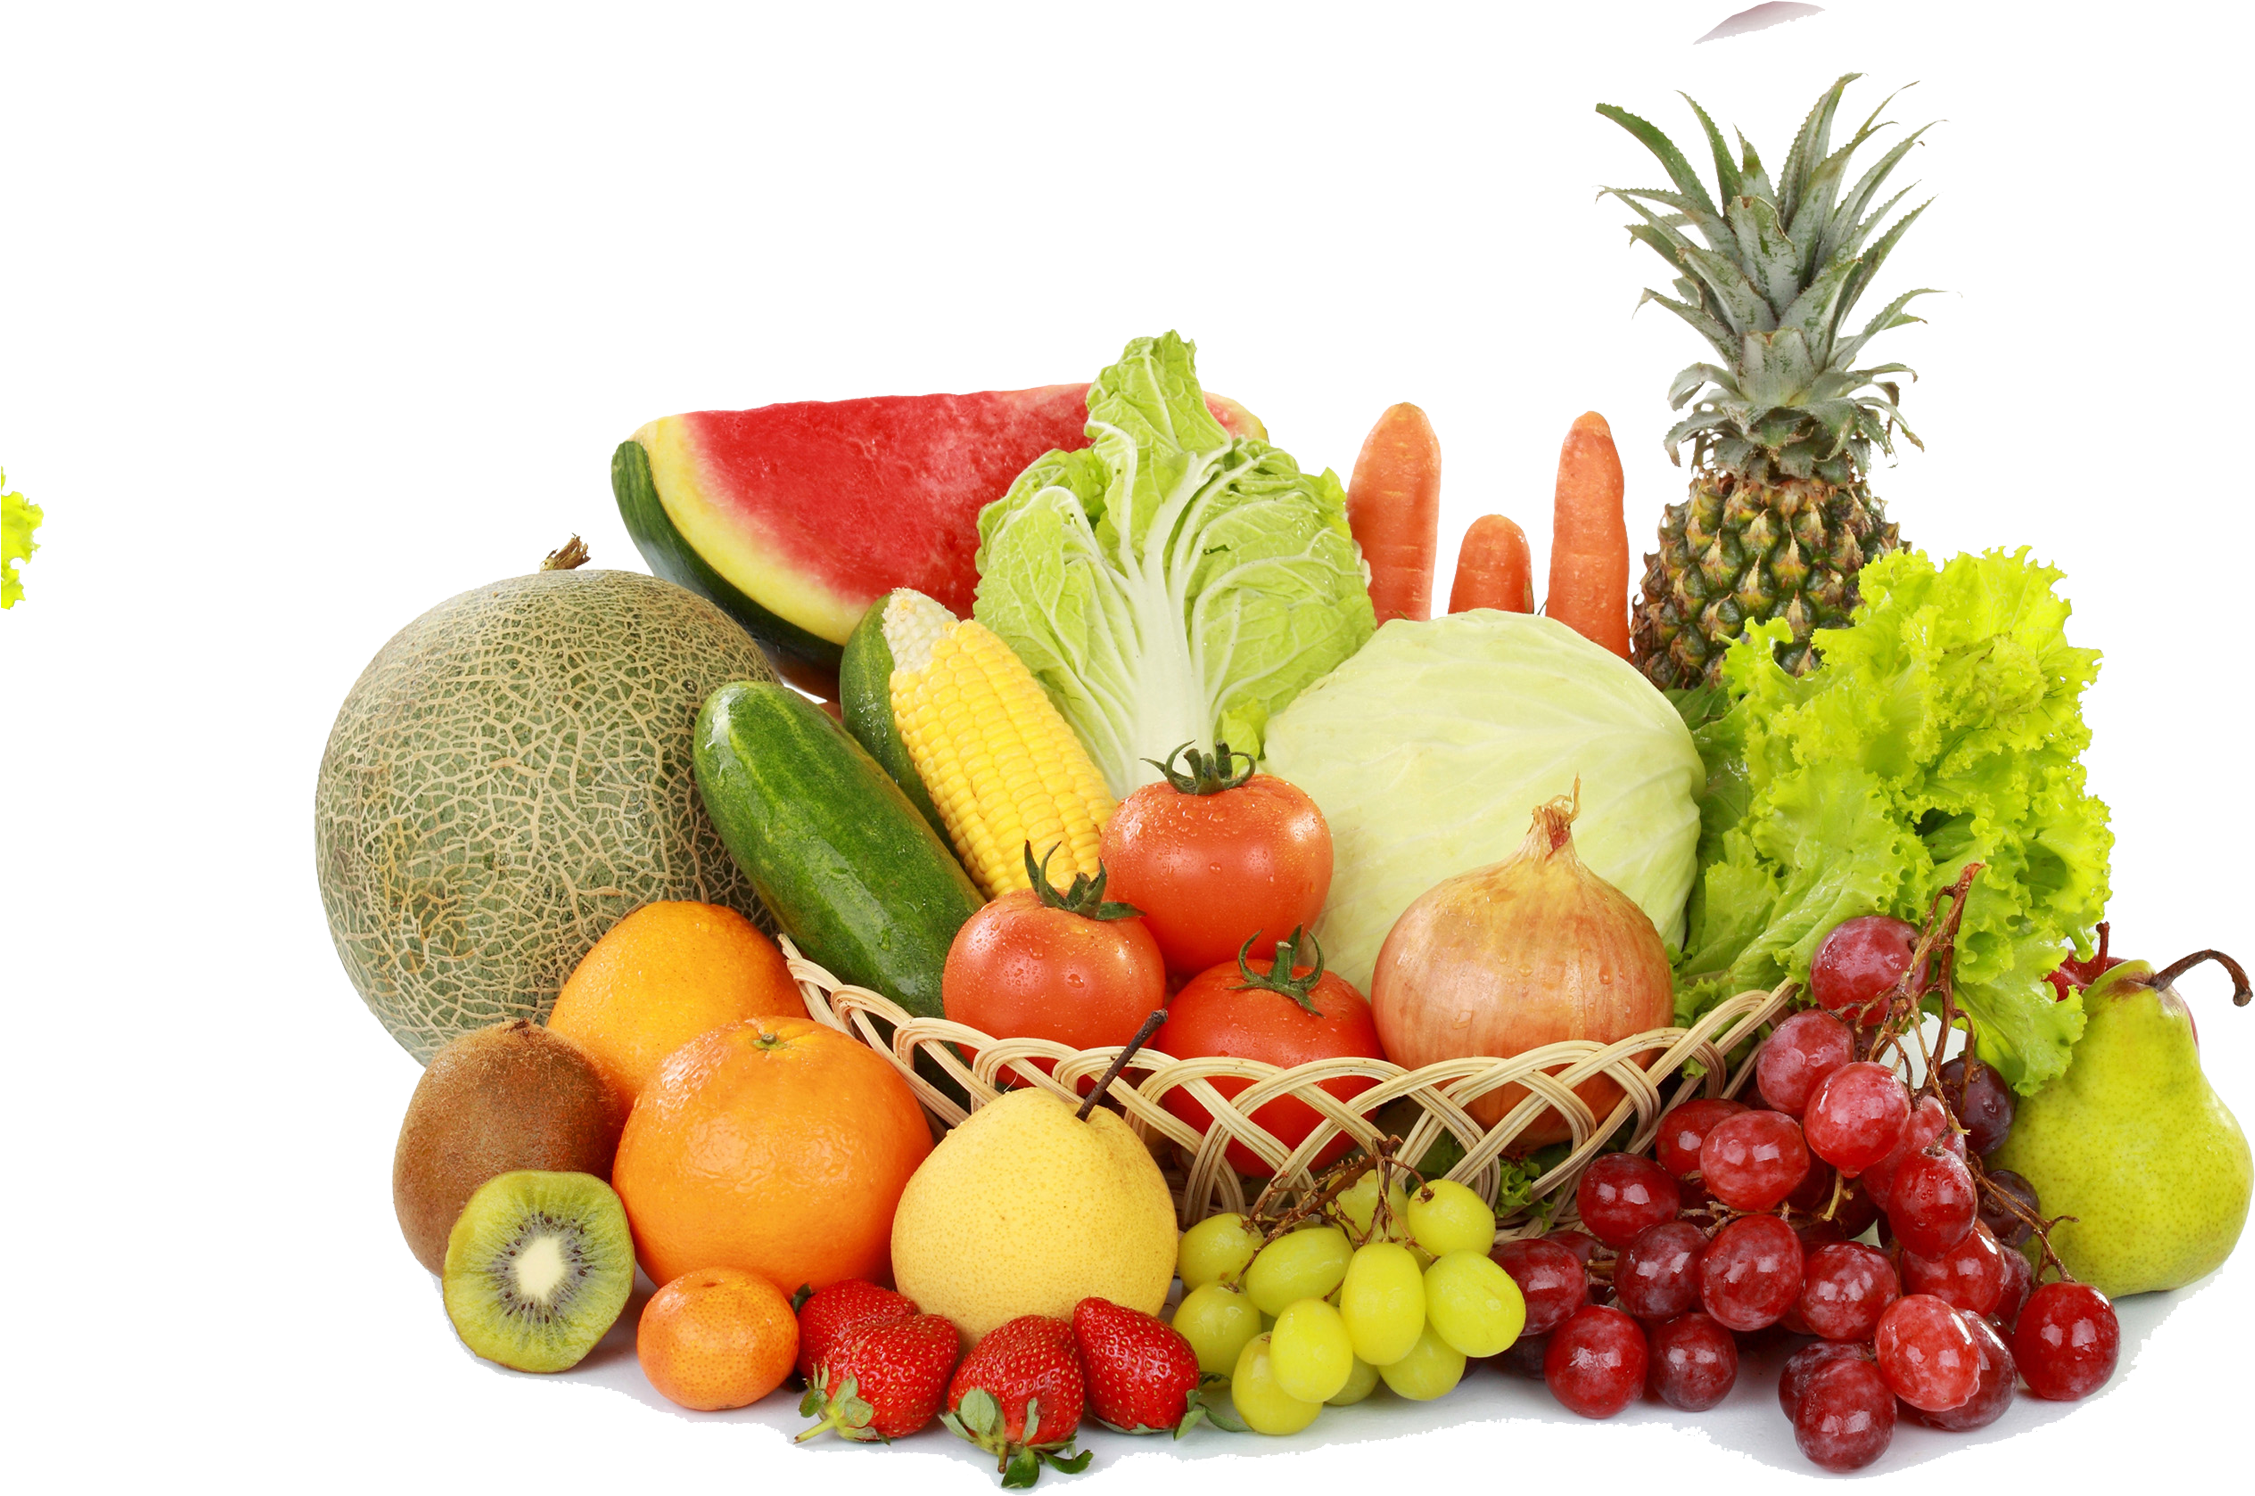 Fruits And Vegetables Transparent Background